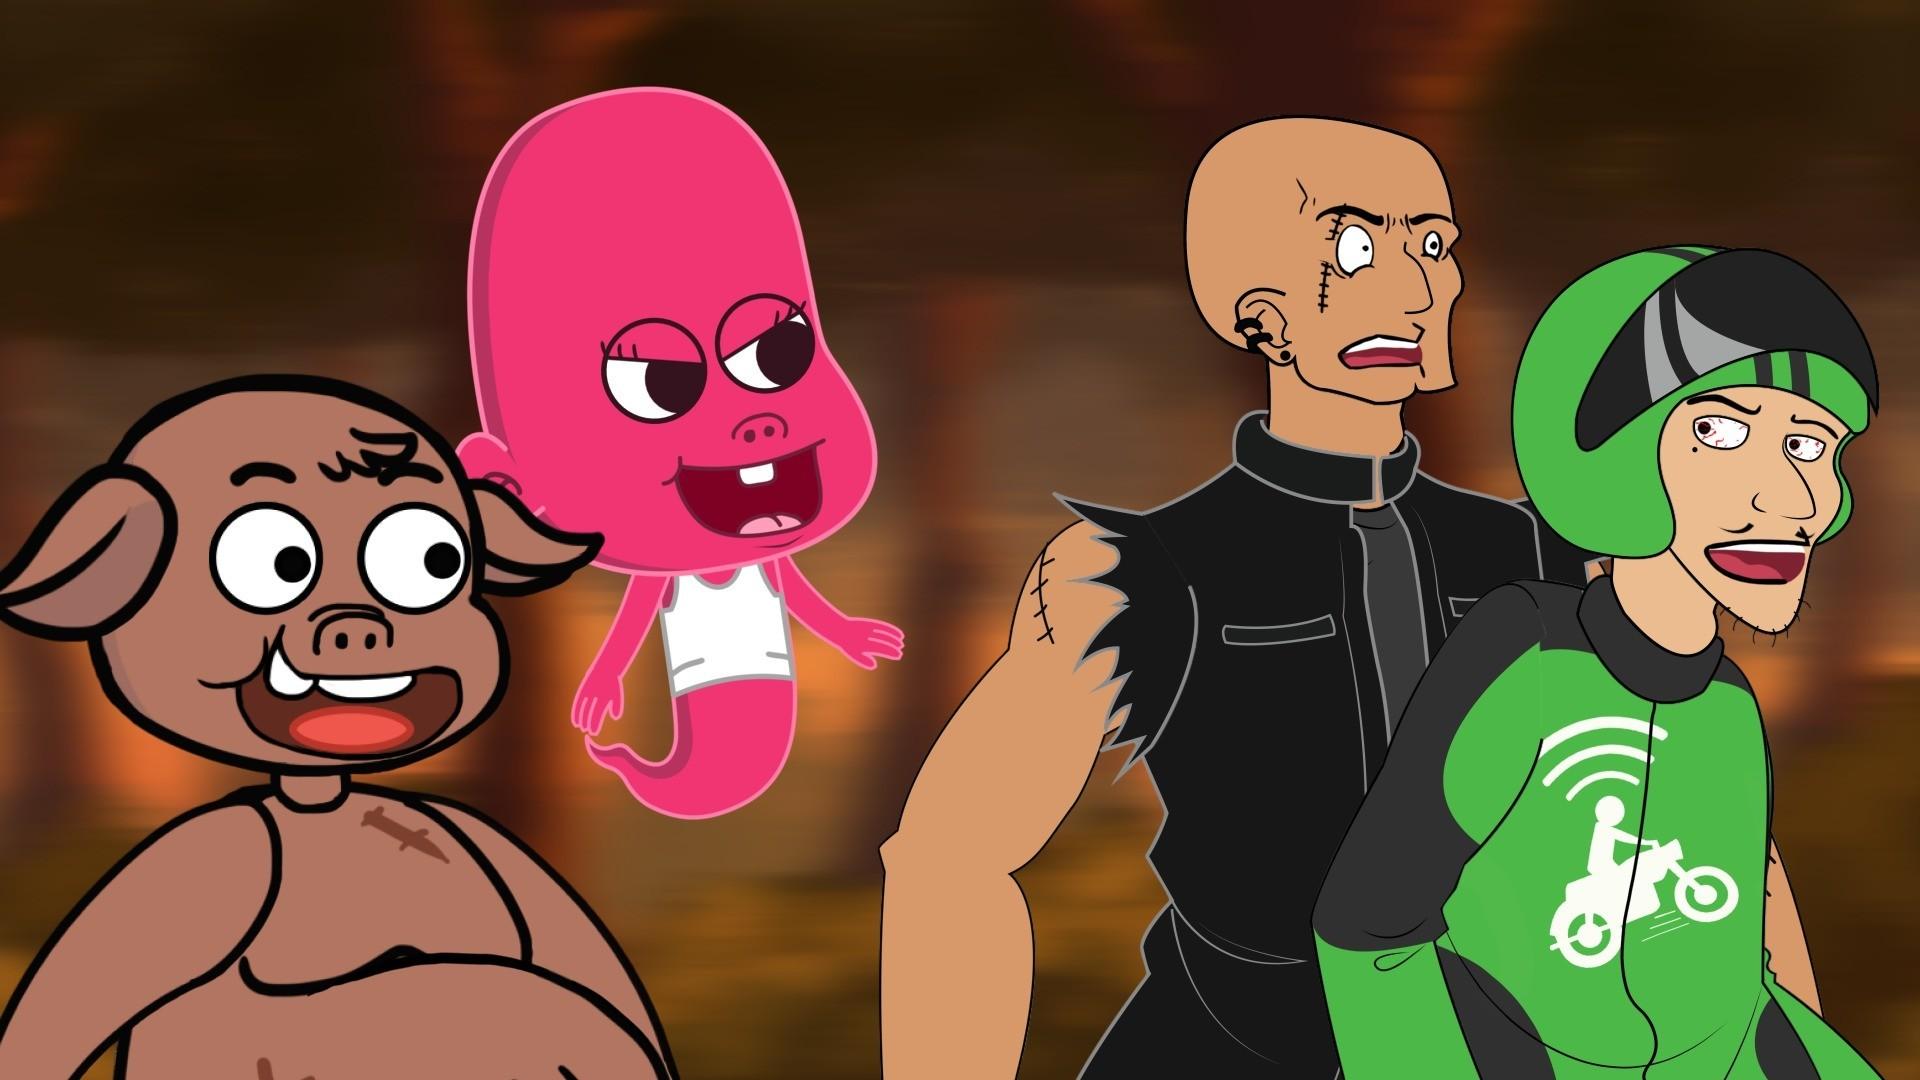 Kartun Lucu Sesajen Si Mbah Dunia Si Etan Animasi Horor Lucu